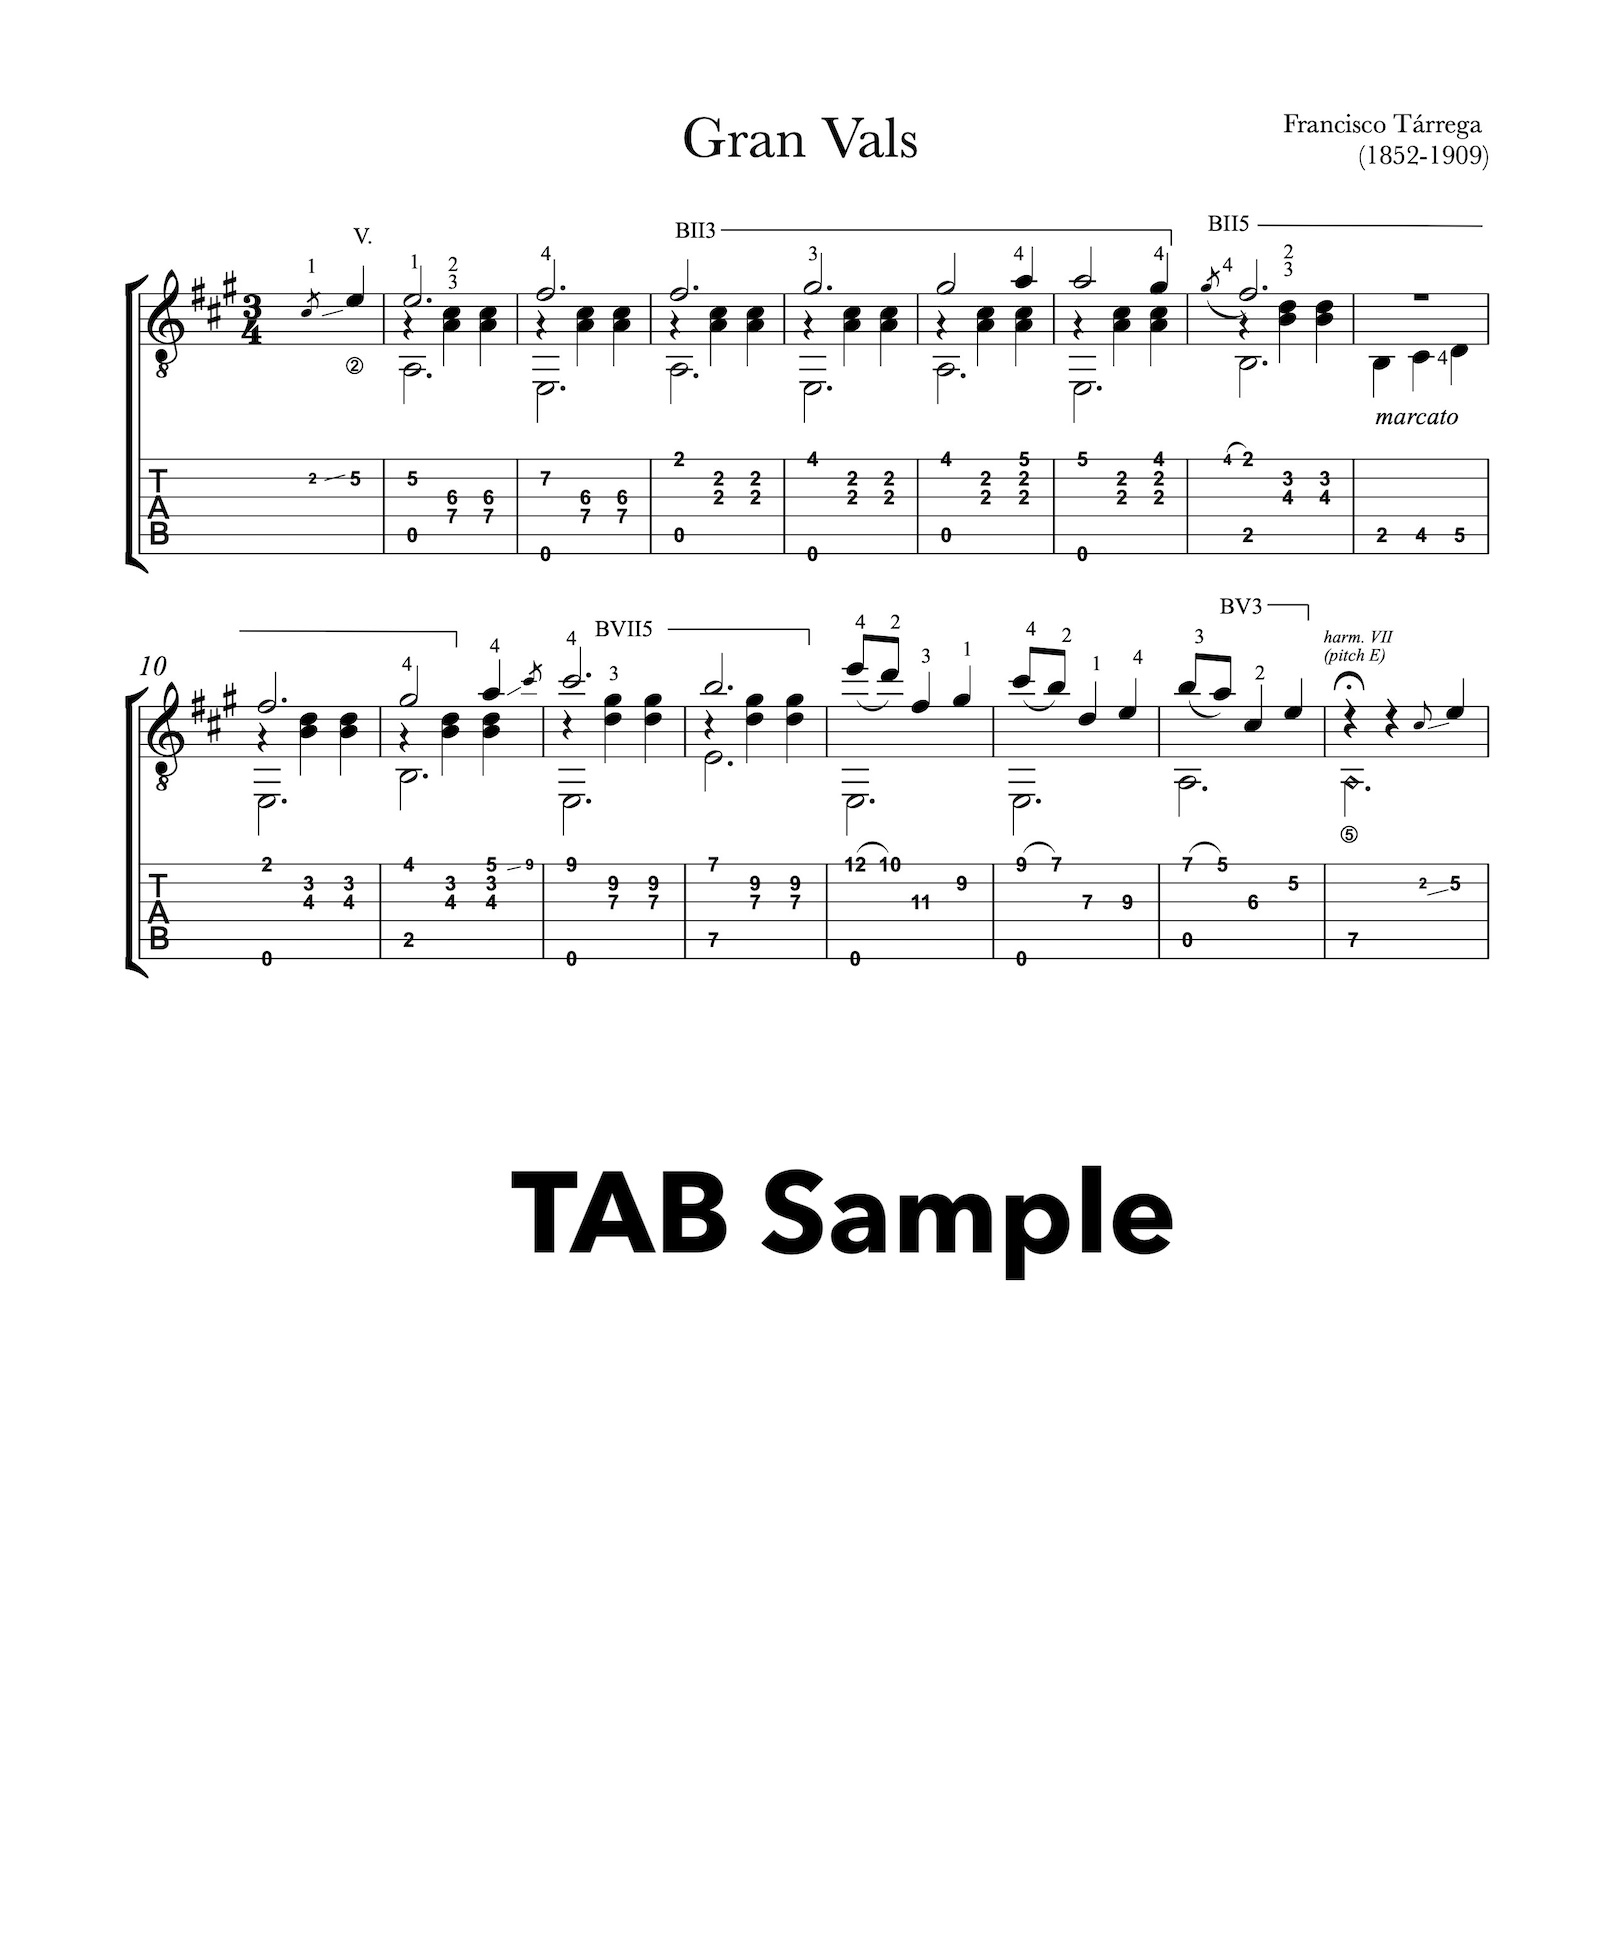 Gran Vals by Tarrega - PDF Tab Sample